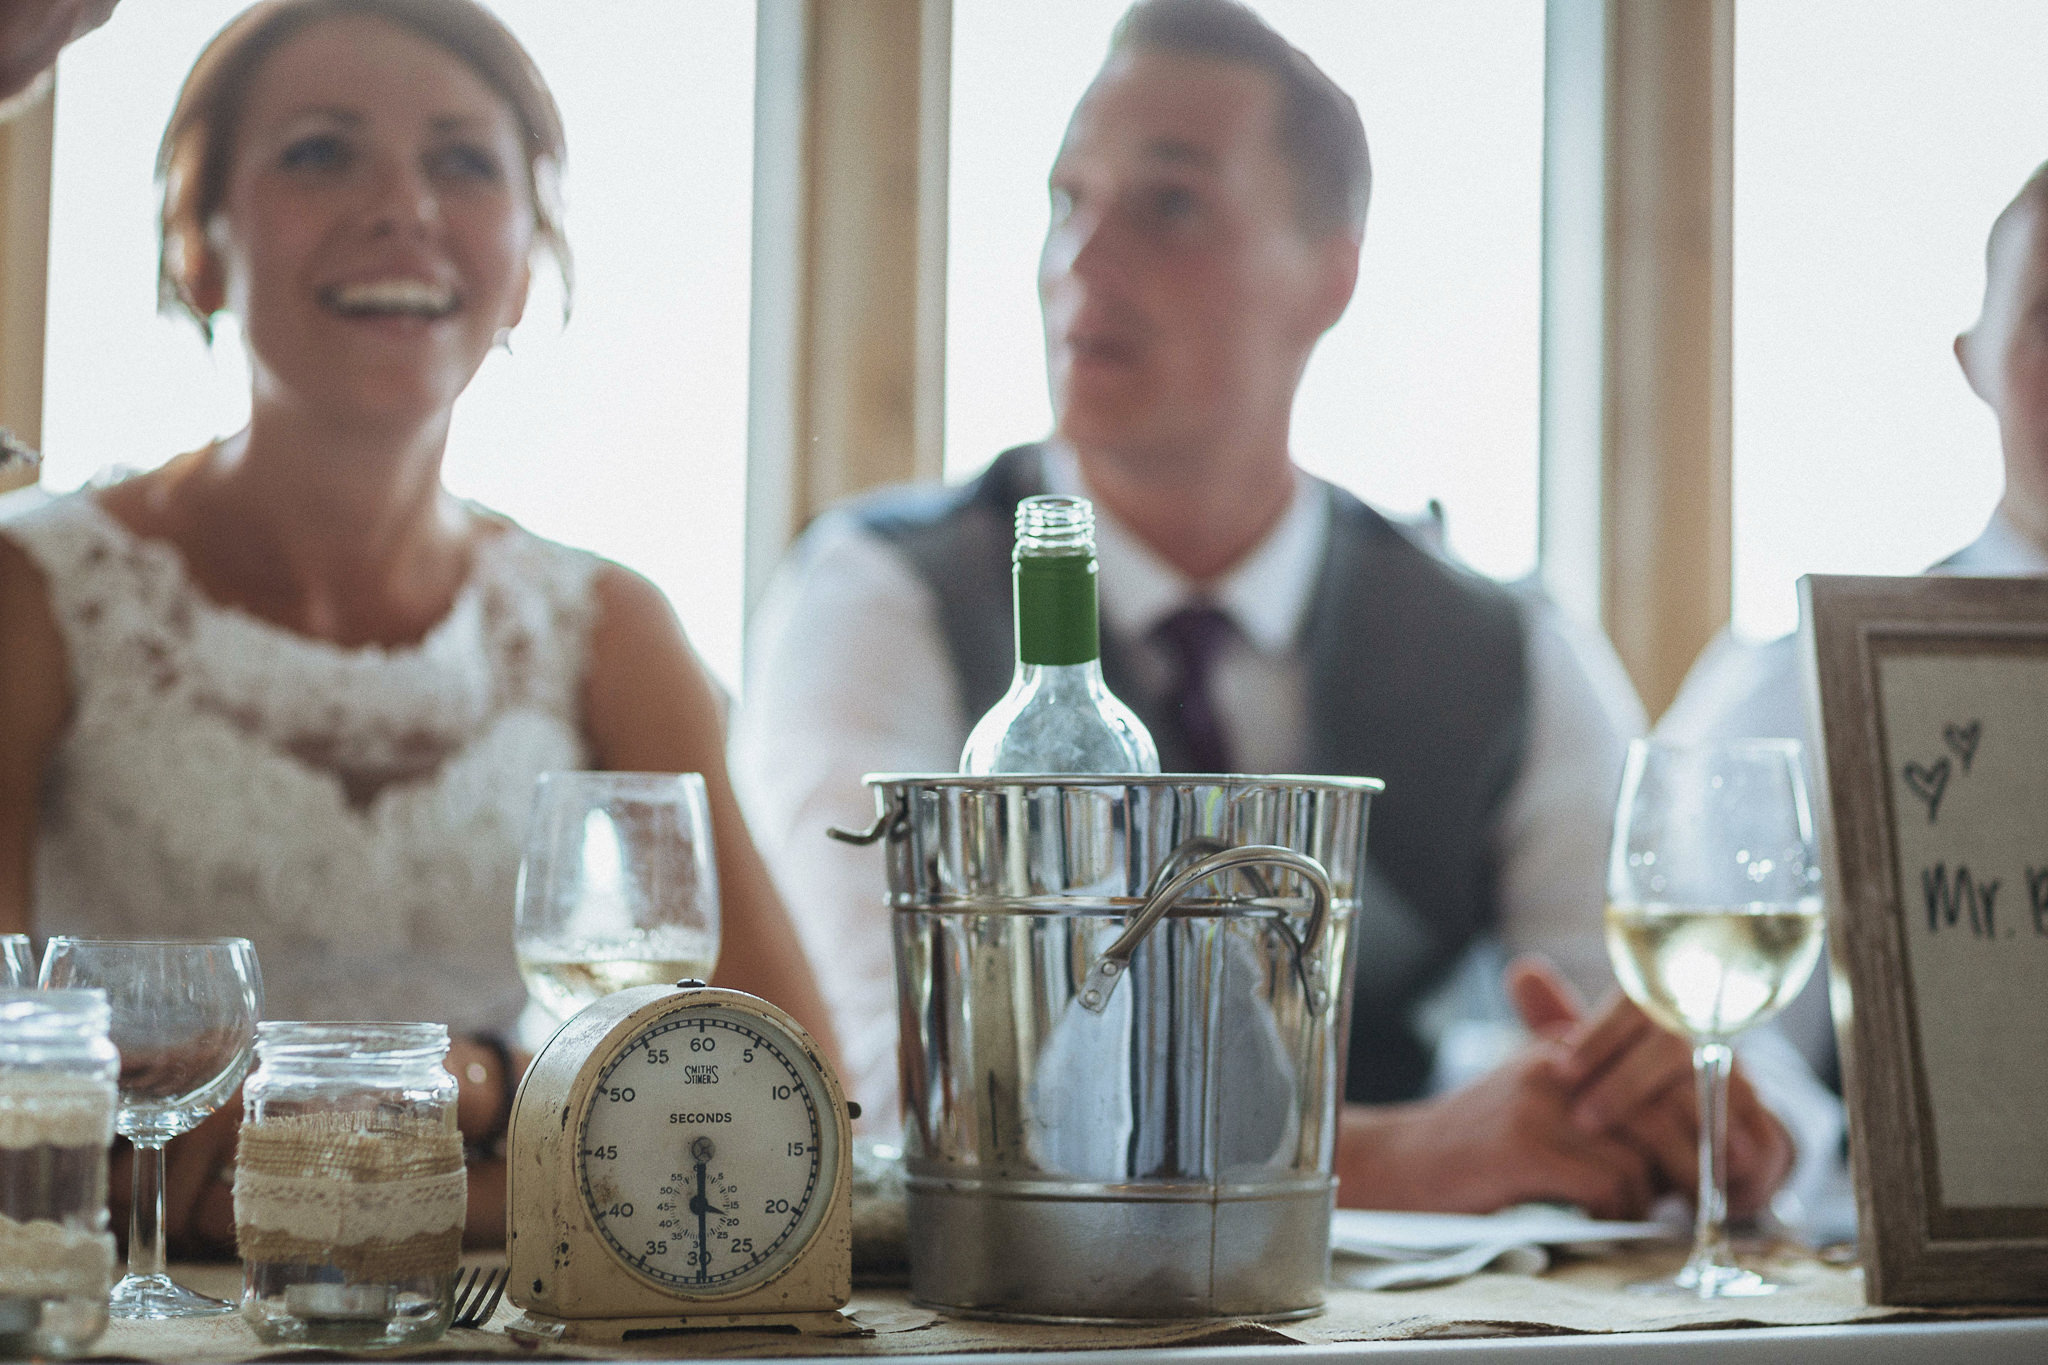 paul-marbrook-Caer-Llan-Wedding-Photographer-90077